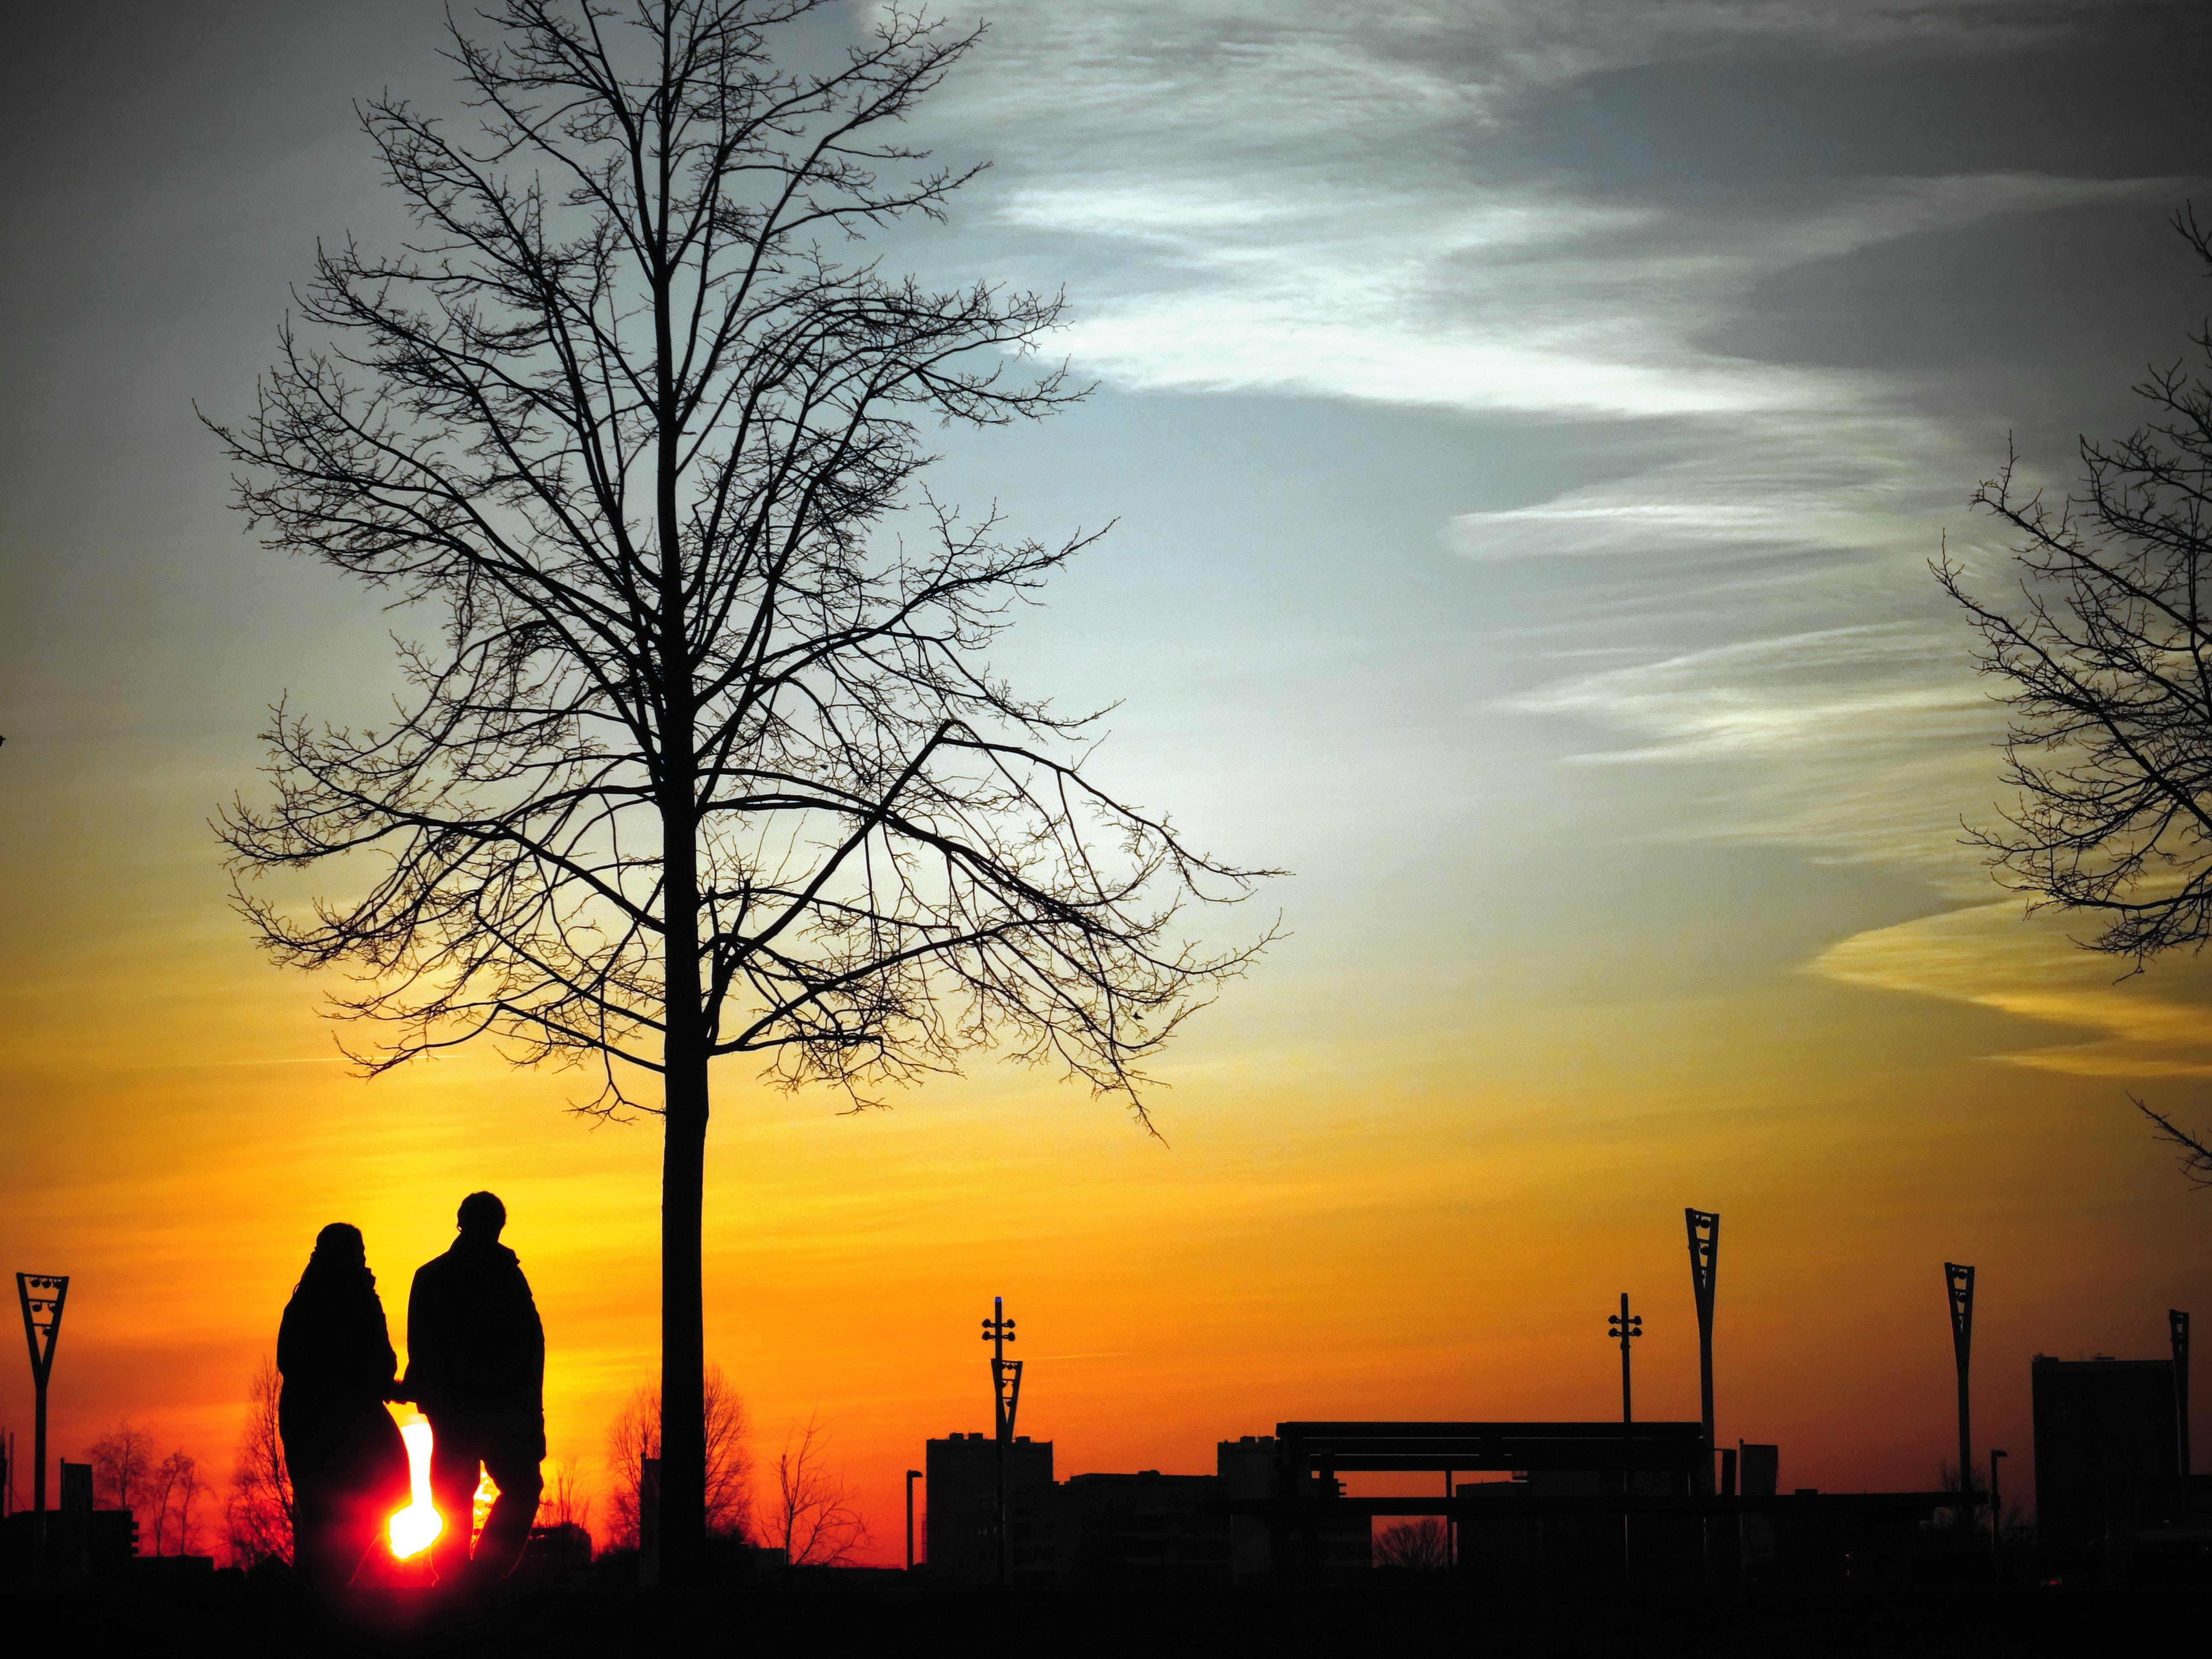 backlit, clouds, couple